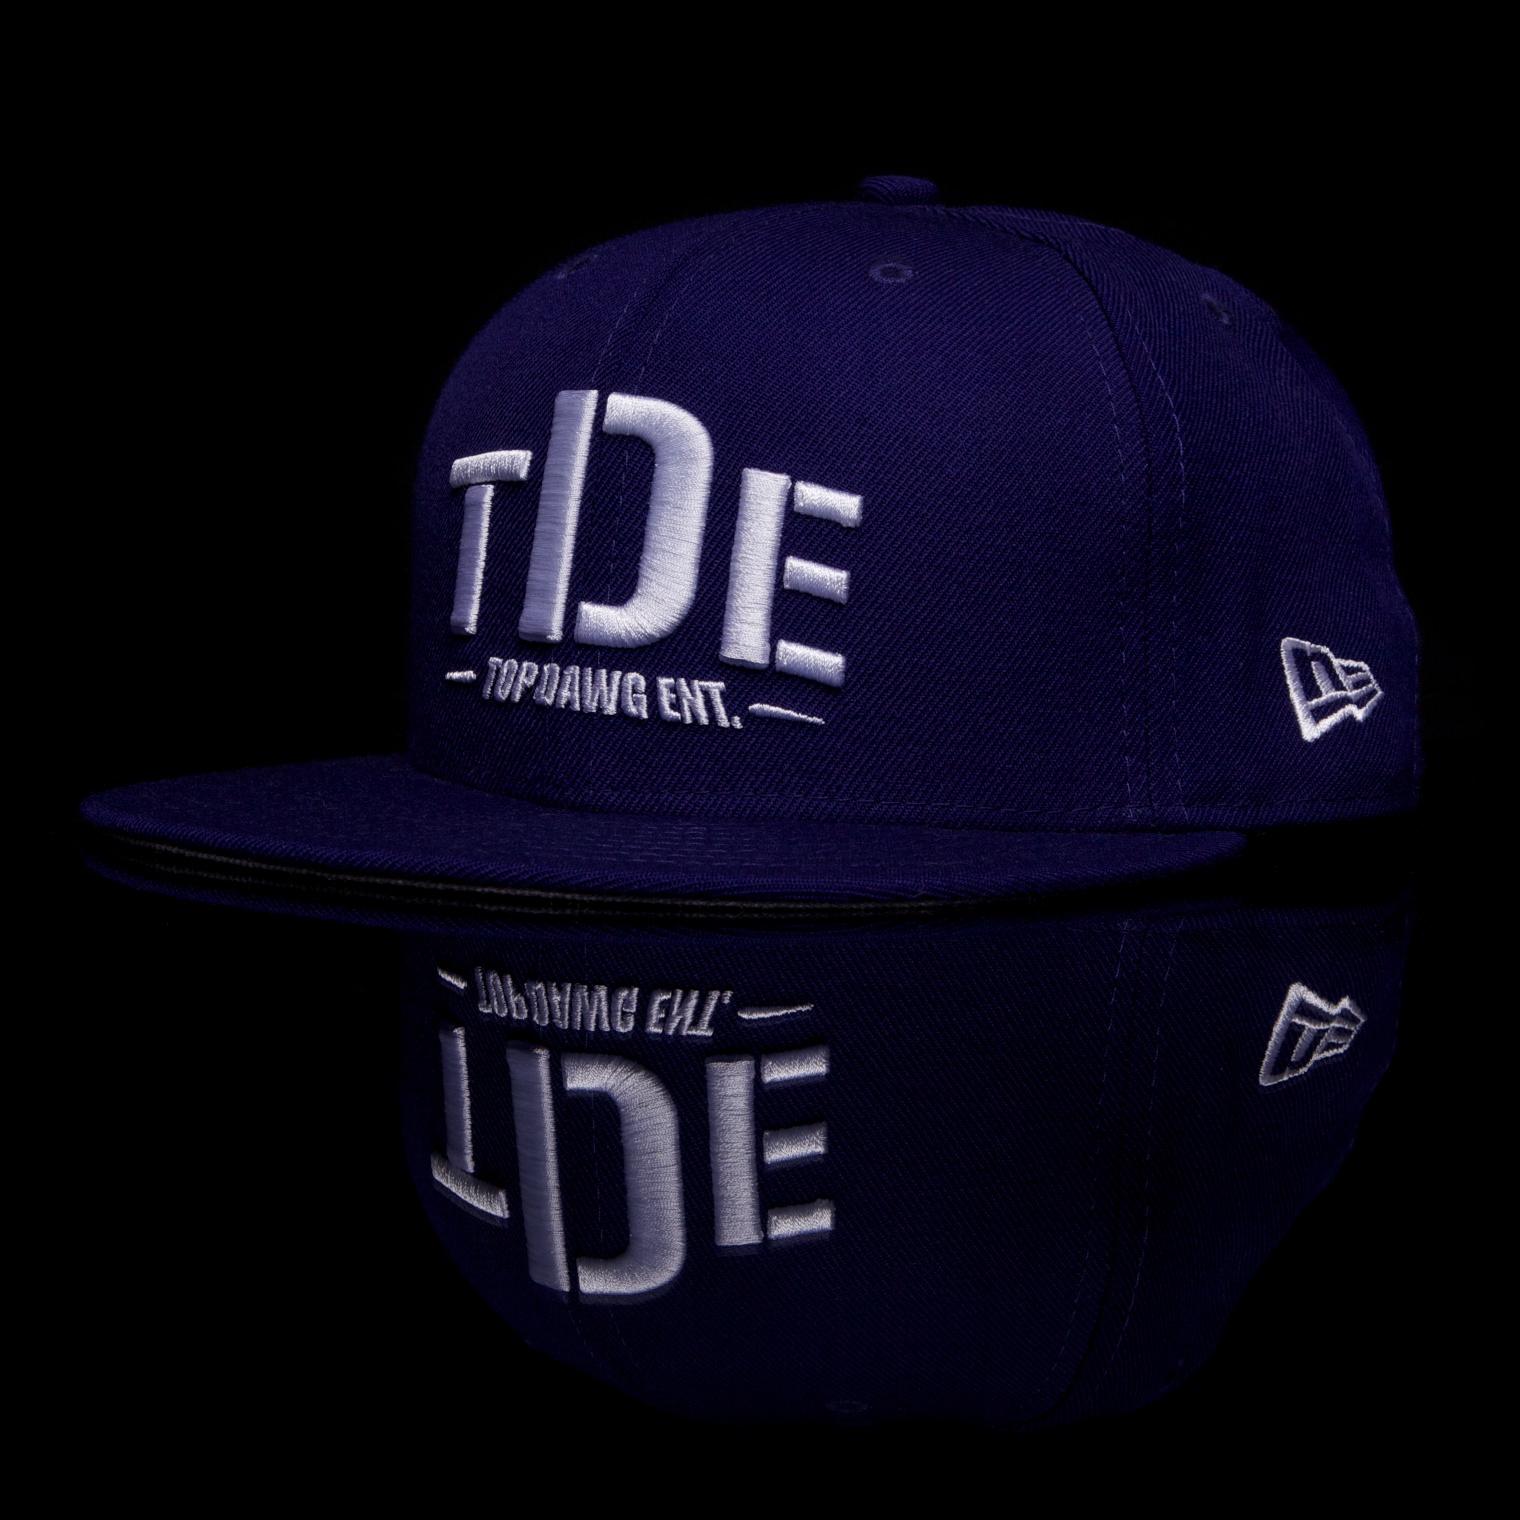 TDE_fitted 061.jpg